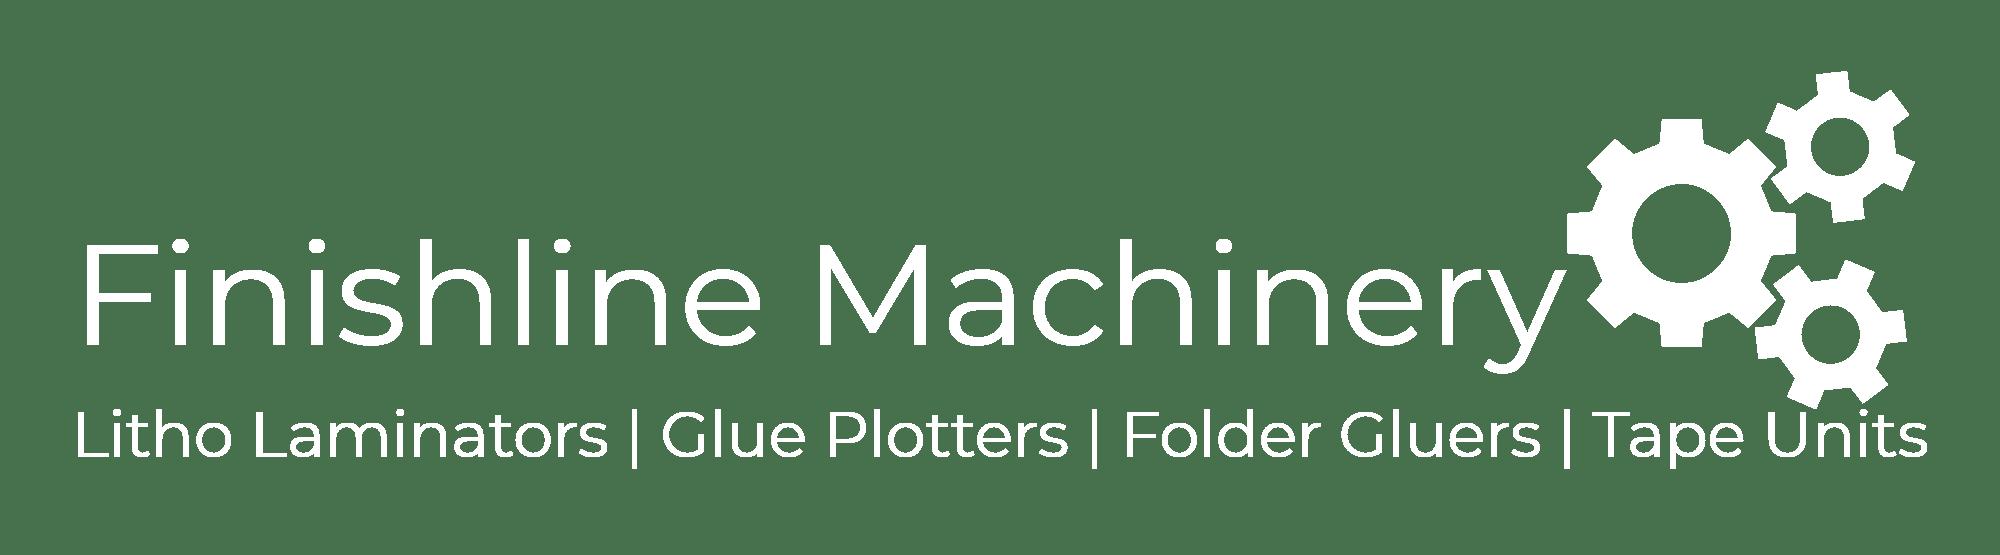 Finishline Machinery XY Glue Plotter Logo white